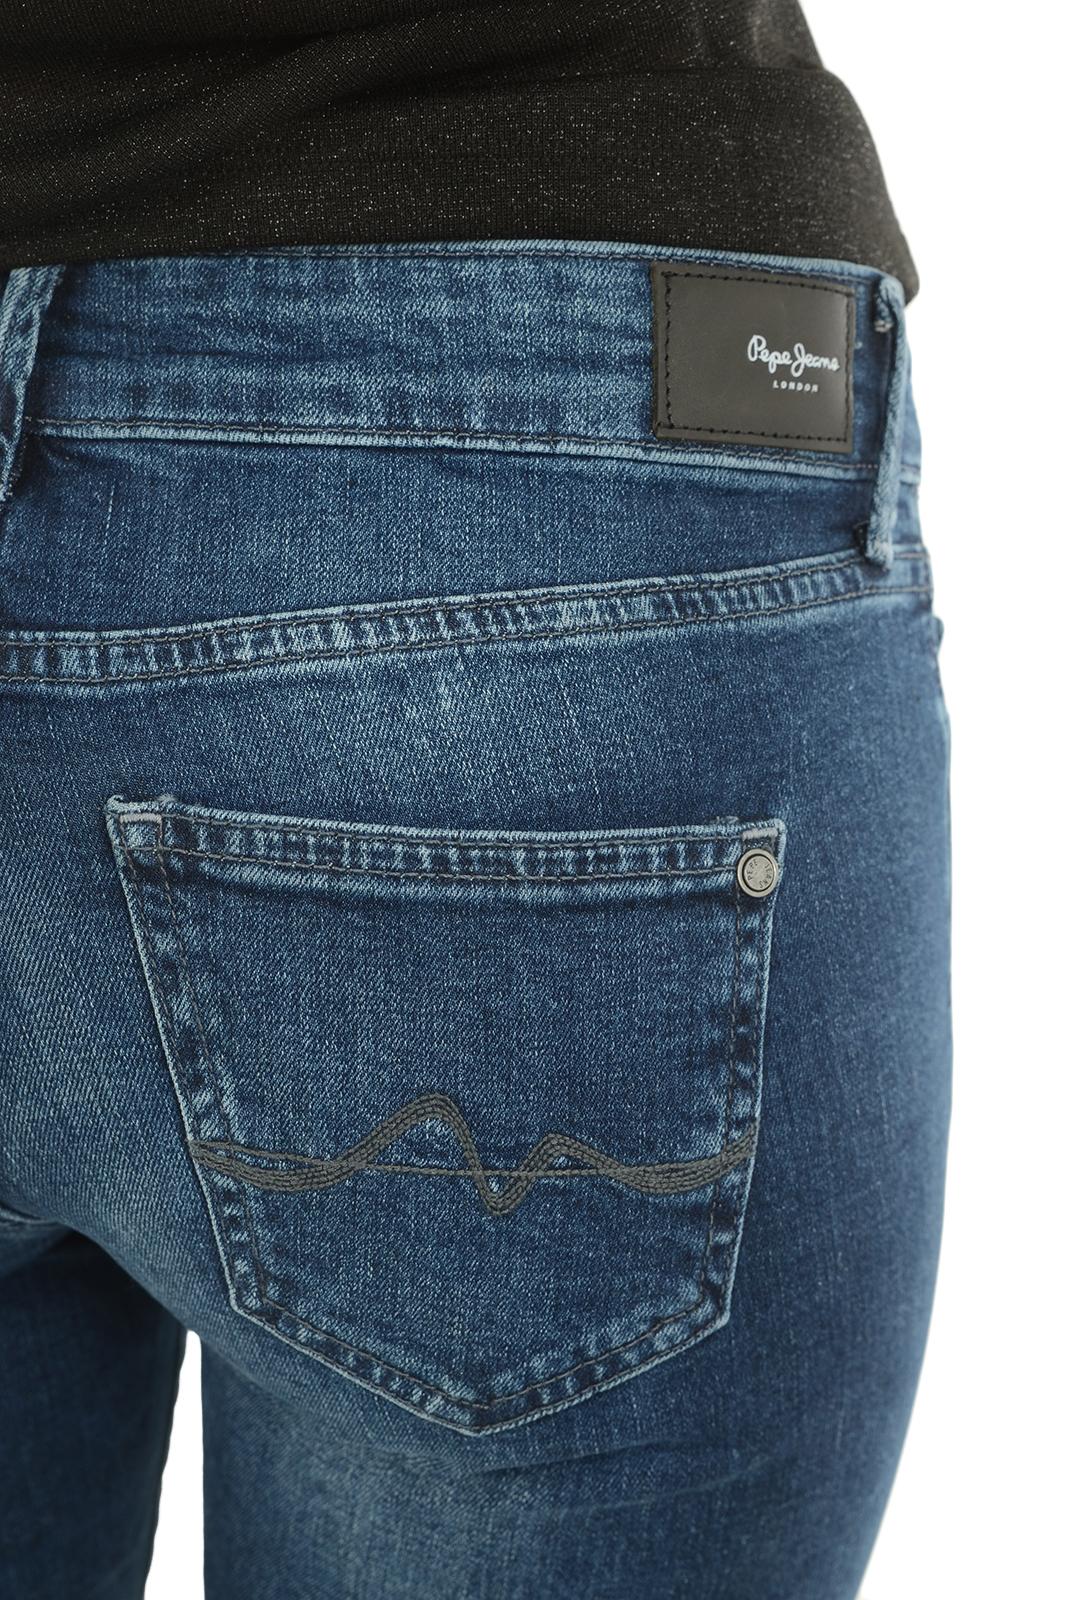 Jeans   Pepe jeans PL200025CA2 PIXIE 000 DENIM